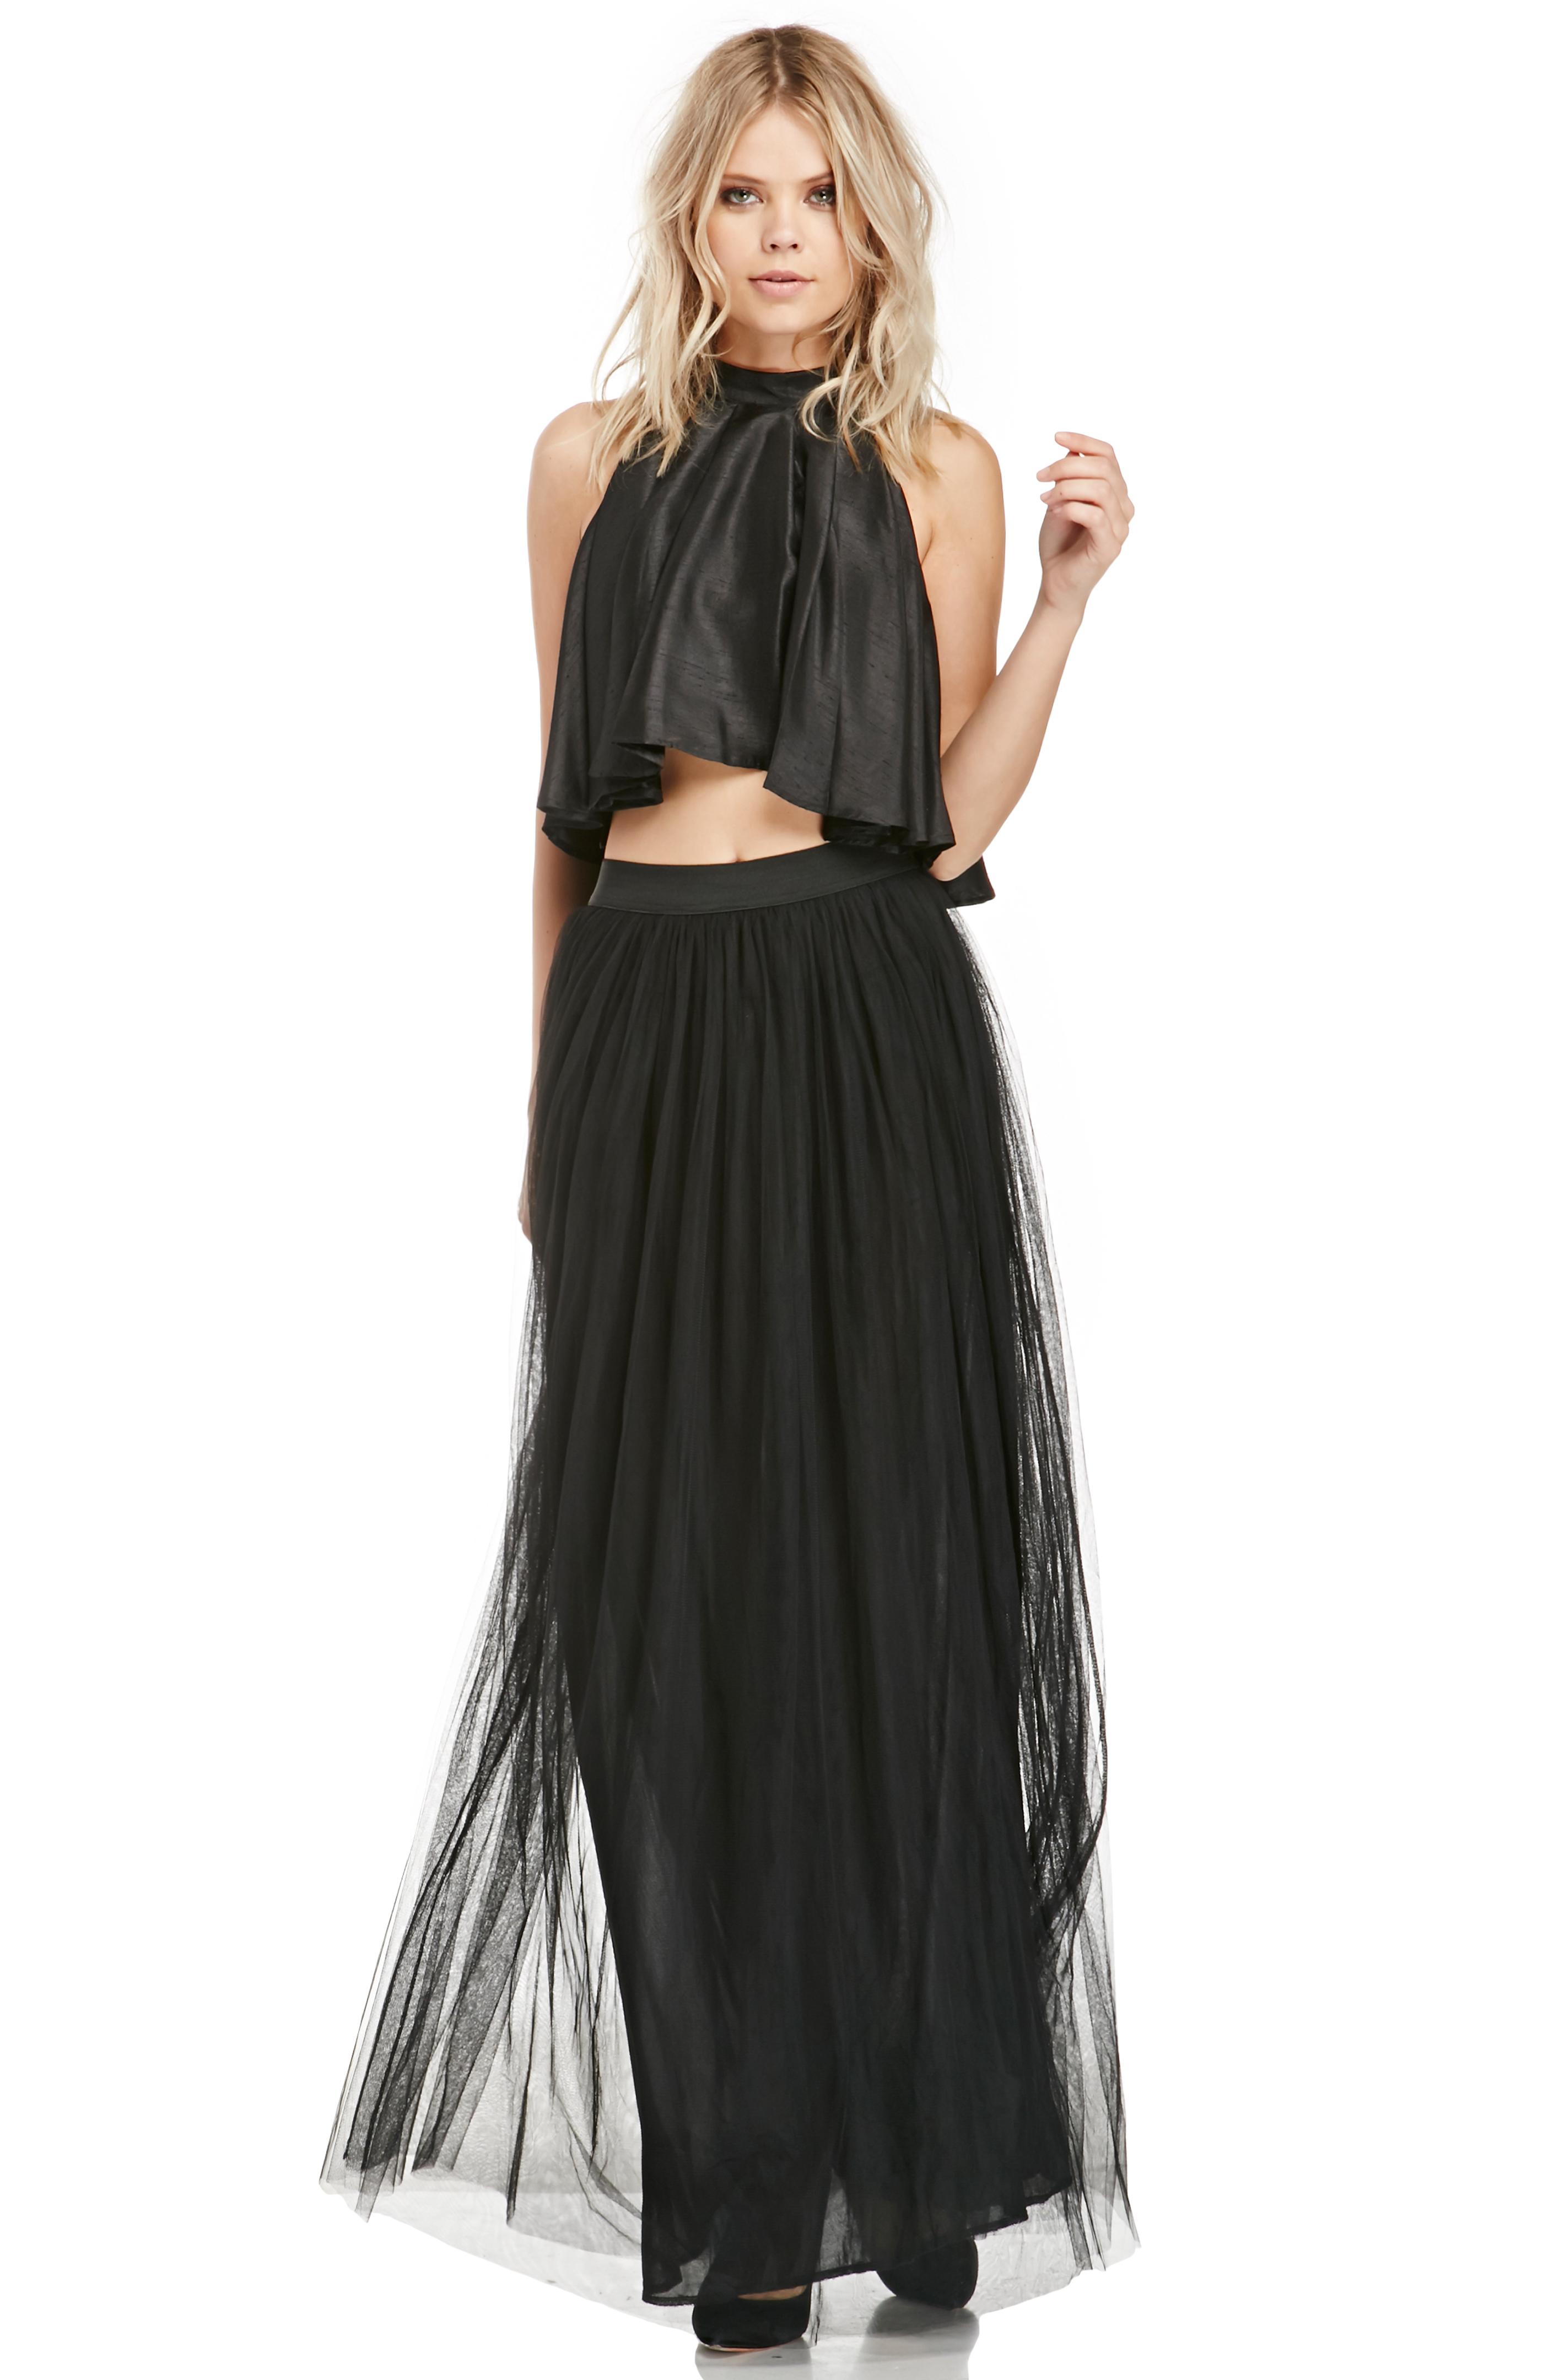 DAILYLOOK Tulle Maxi Skirt in black XS - L at DAILYLOOK